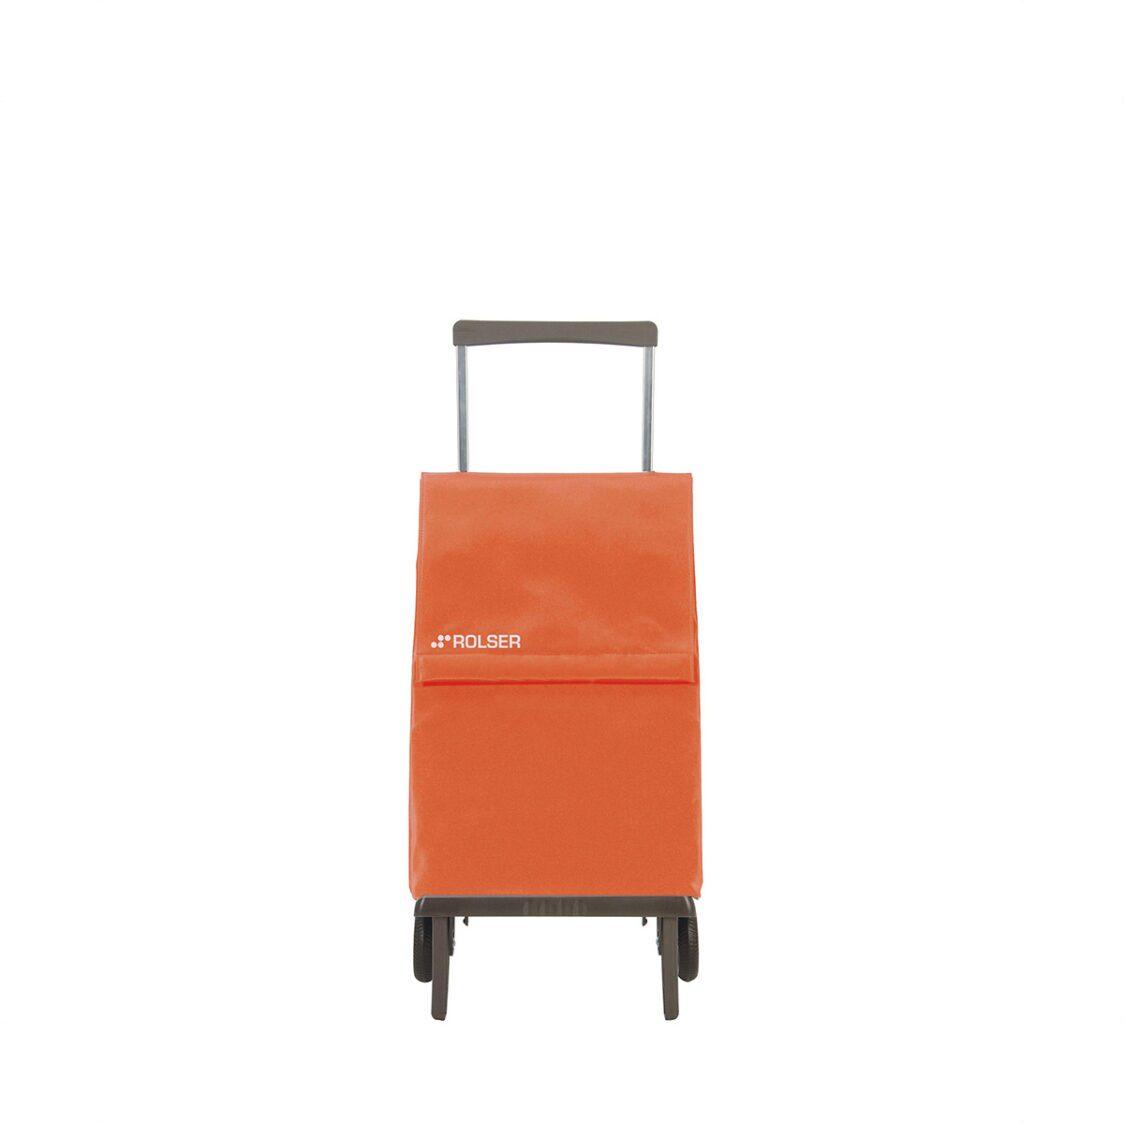 Rolser Plegamatic Mandarina Orange J40032